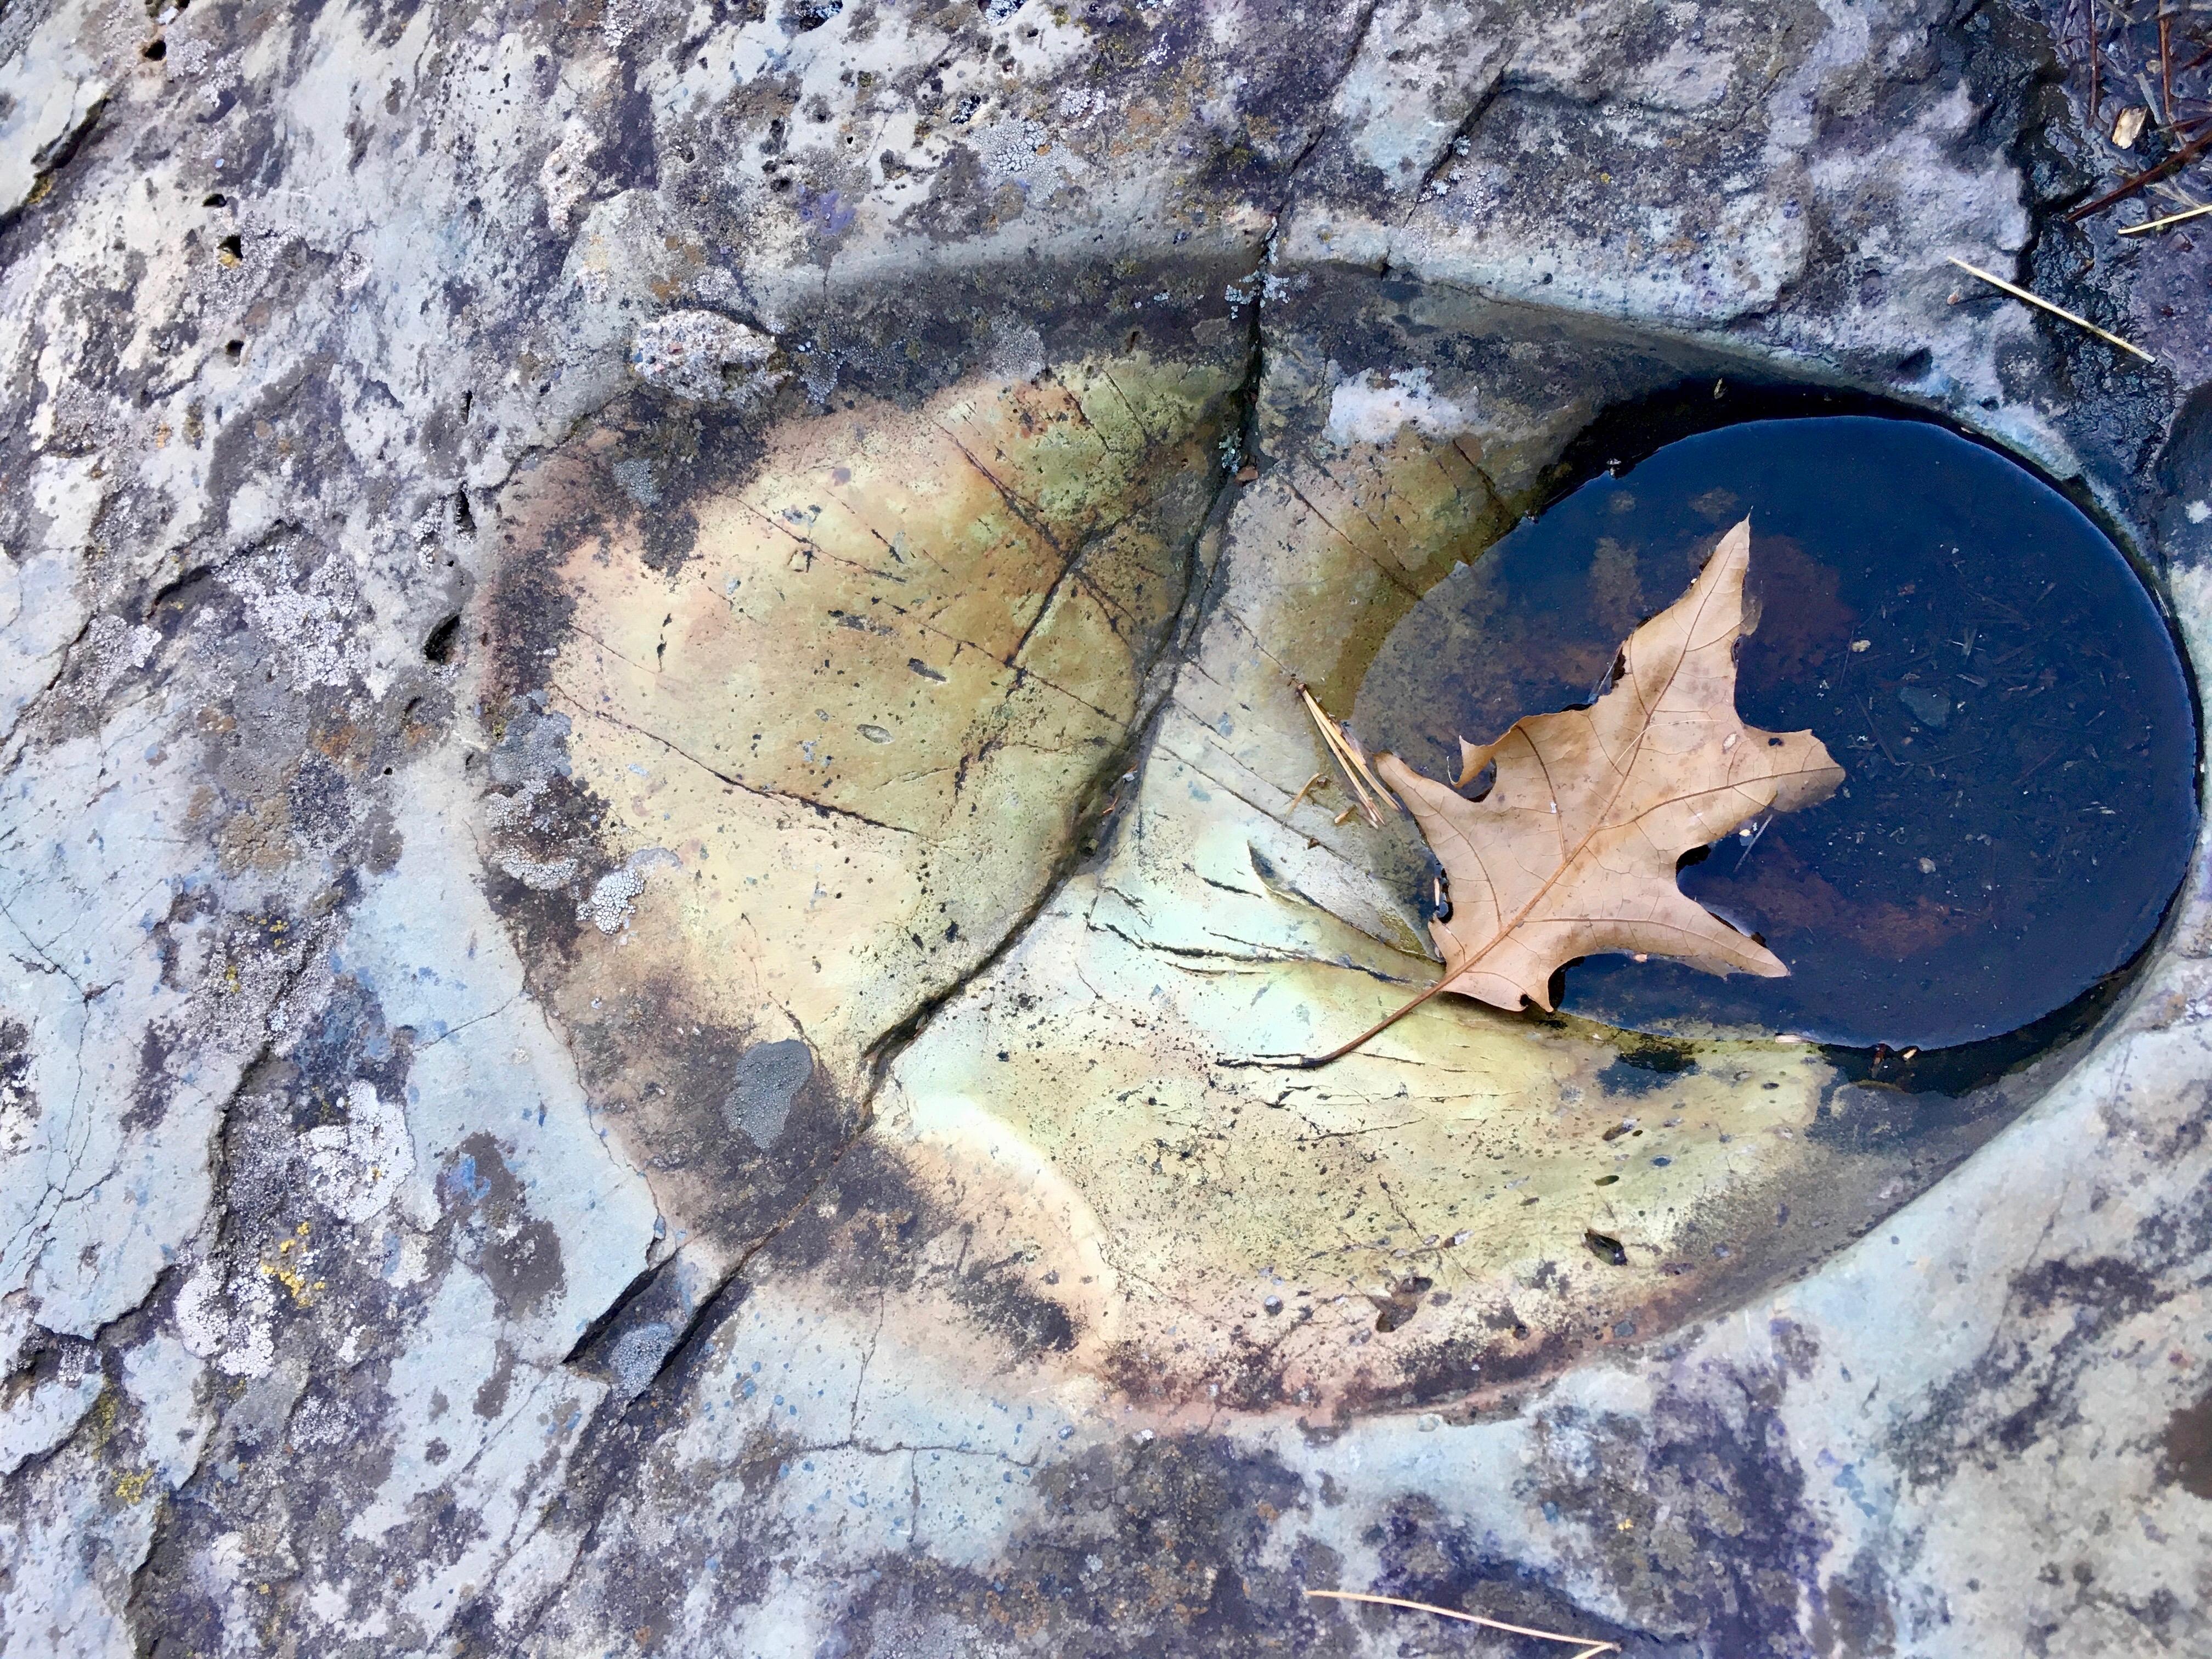 """Autumn's End"" Nature photography by local Tacoma artist Jennifer Preston Chushcoff."